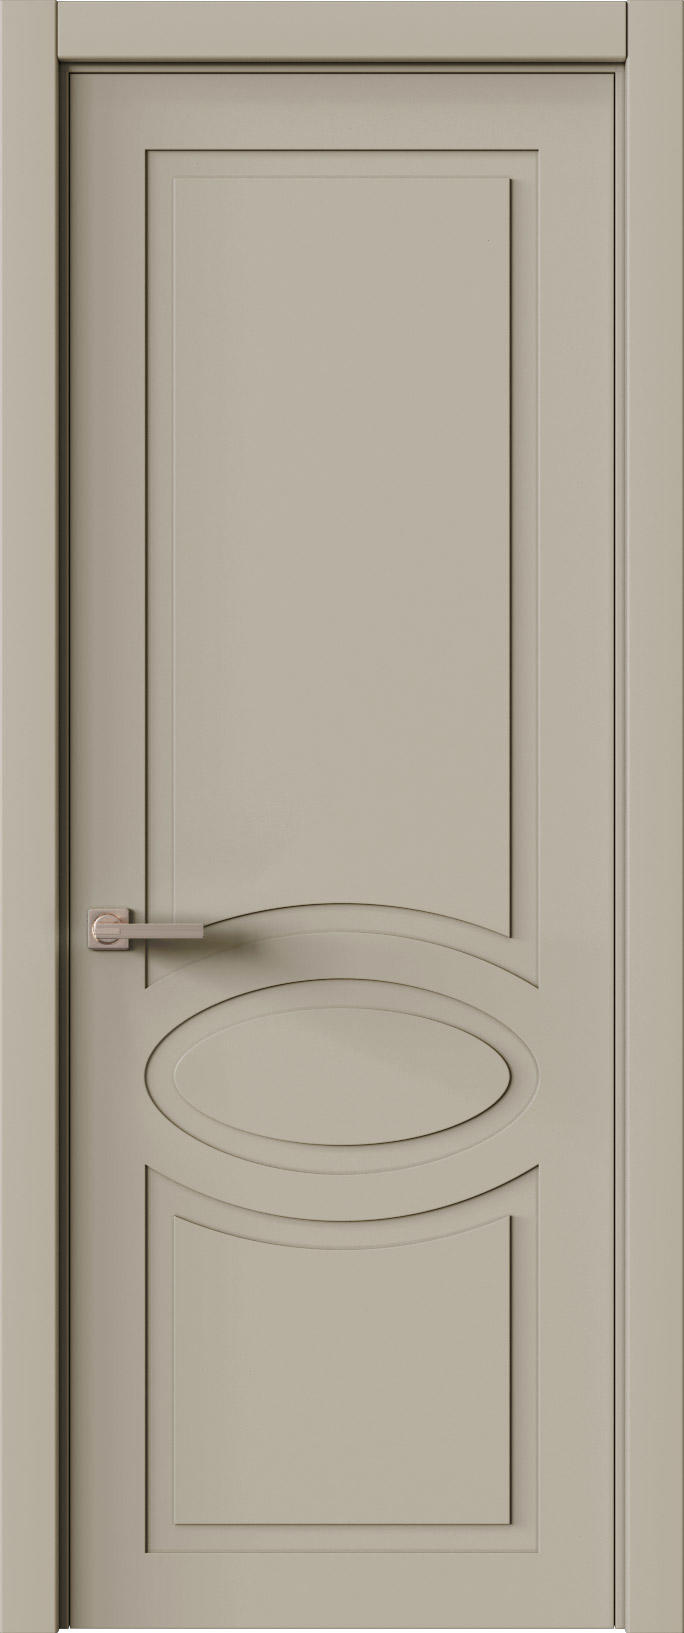 Tivoli Н-5 цвет - Серо-оливковая эмаль (RAL 7032) Без стекла (ДГ)